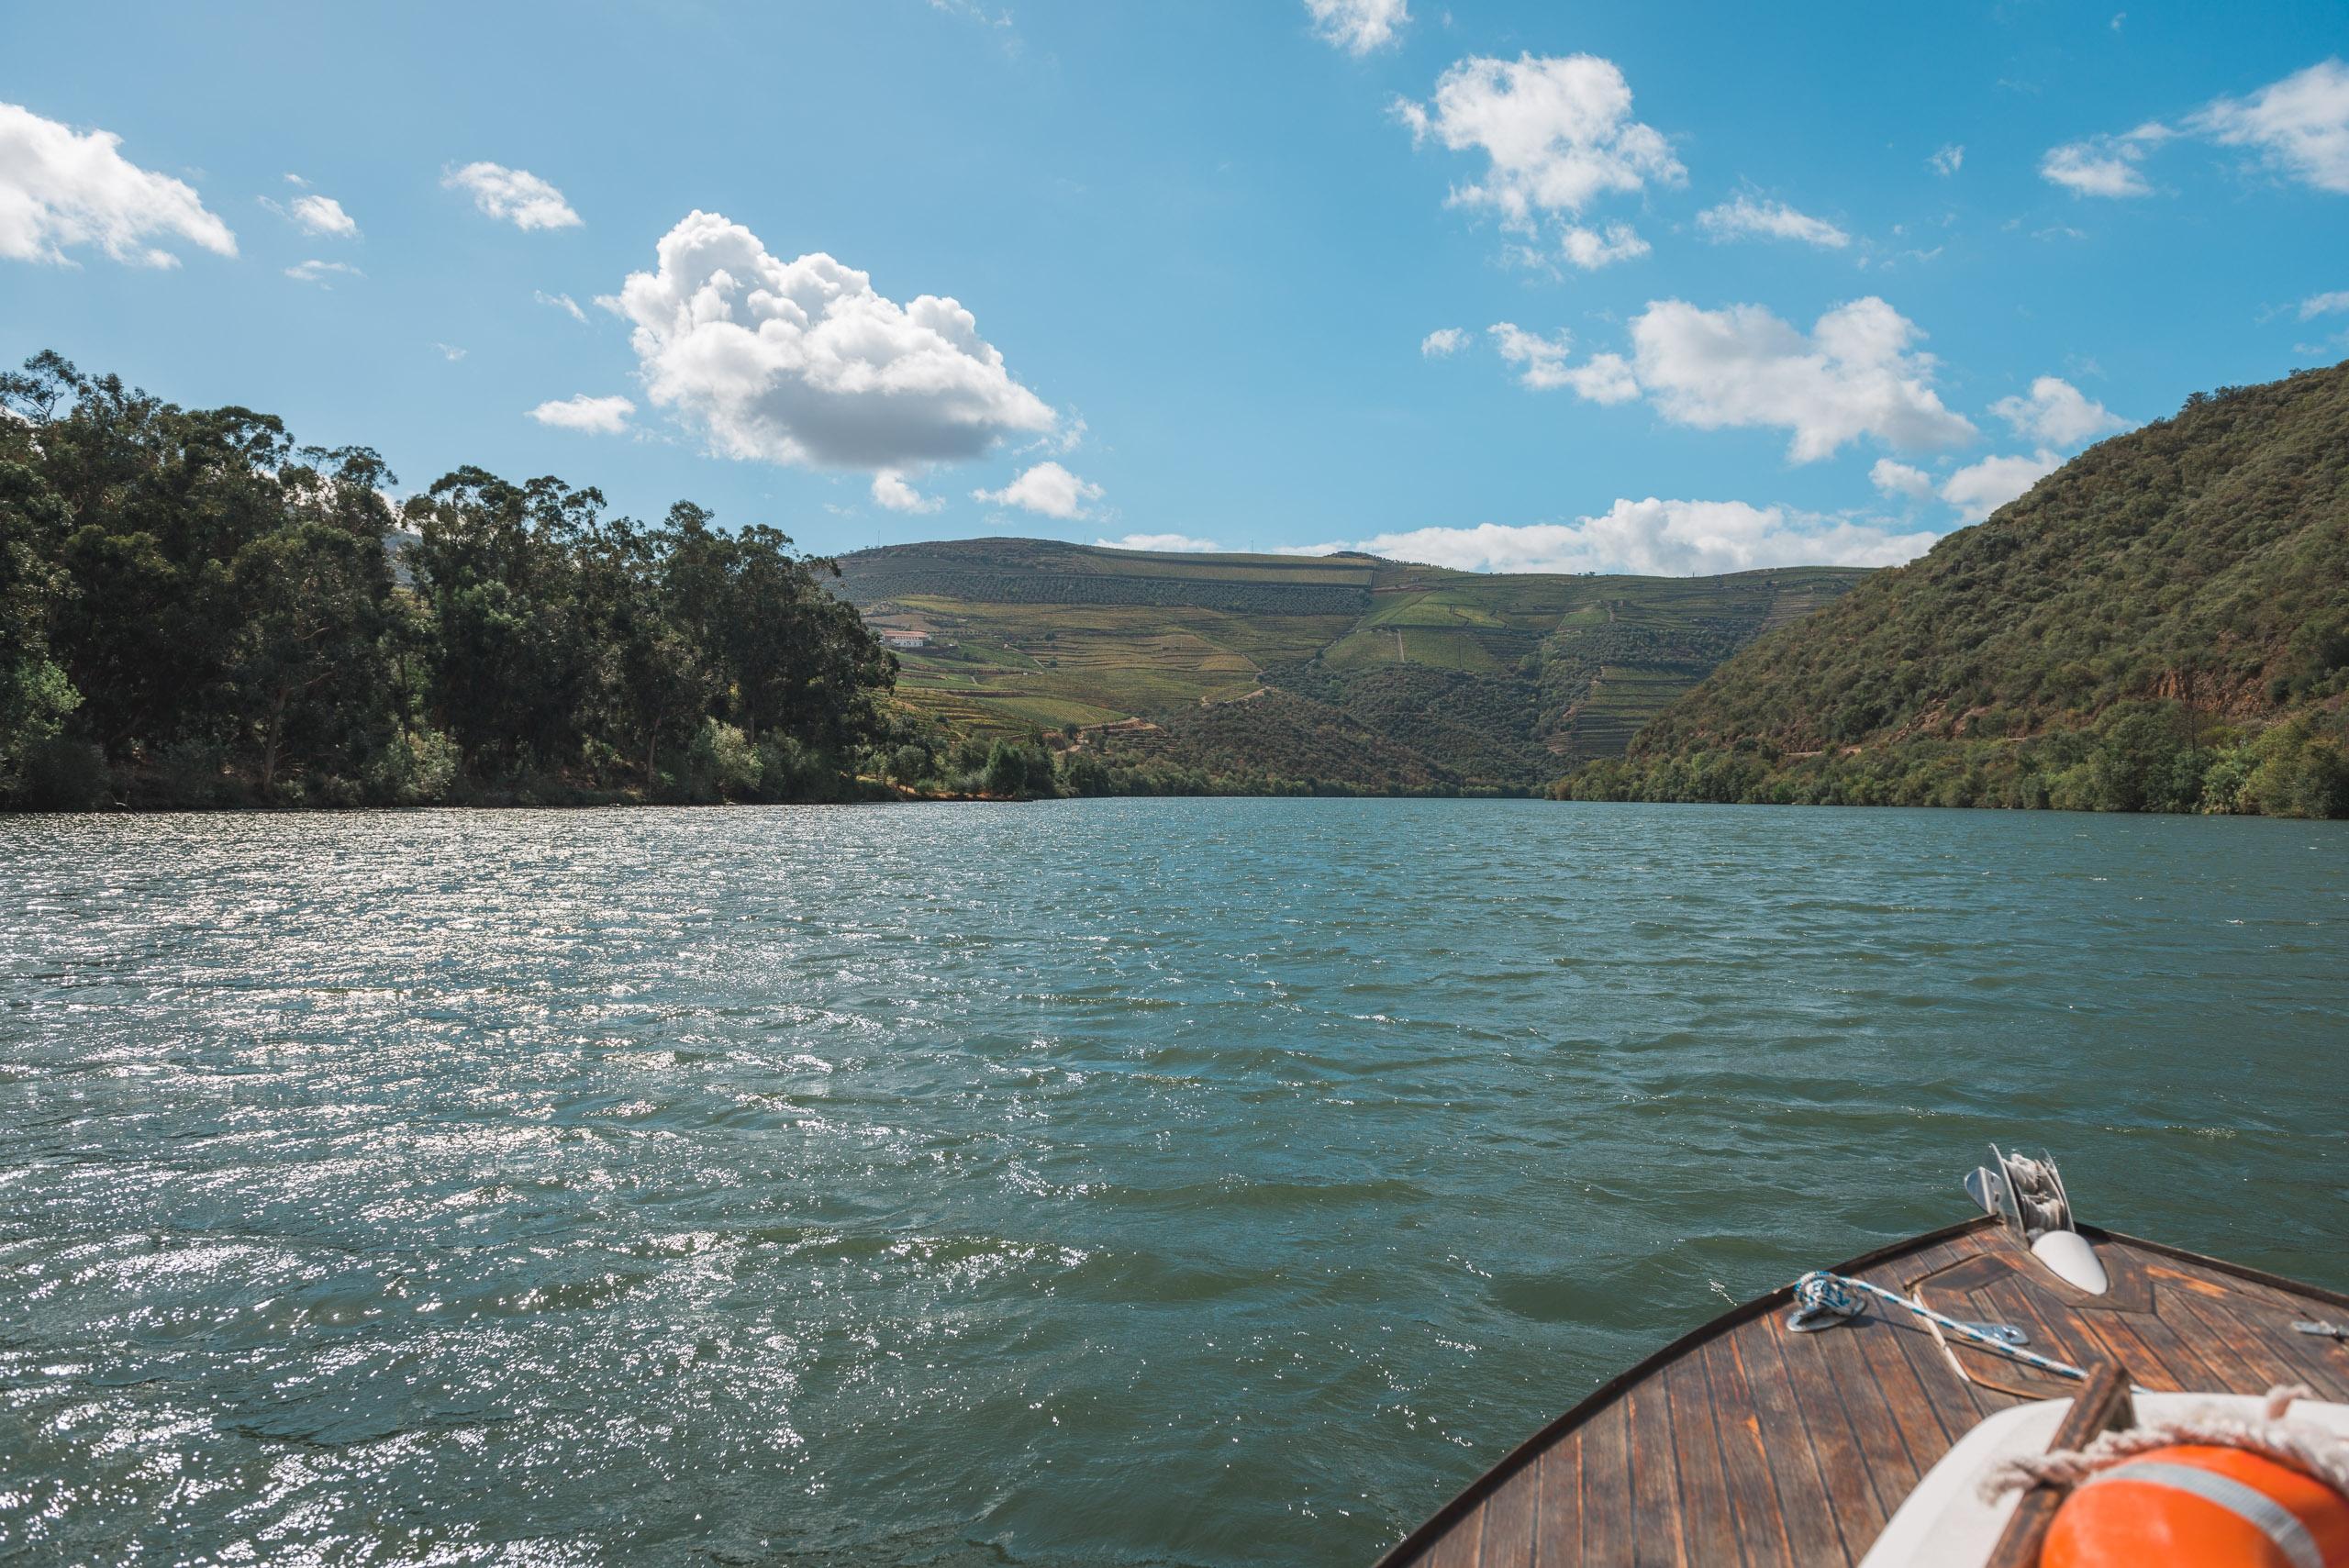 Portugal - The Douro Valley - 2012-0926-DSC_1890_70011